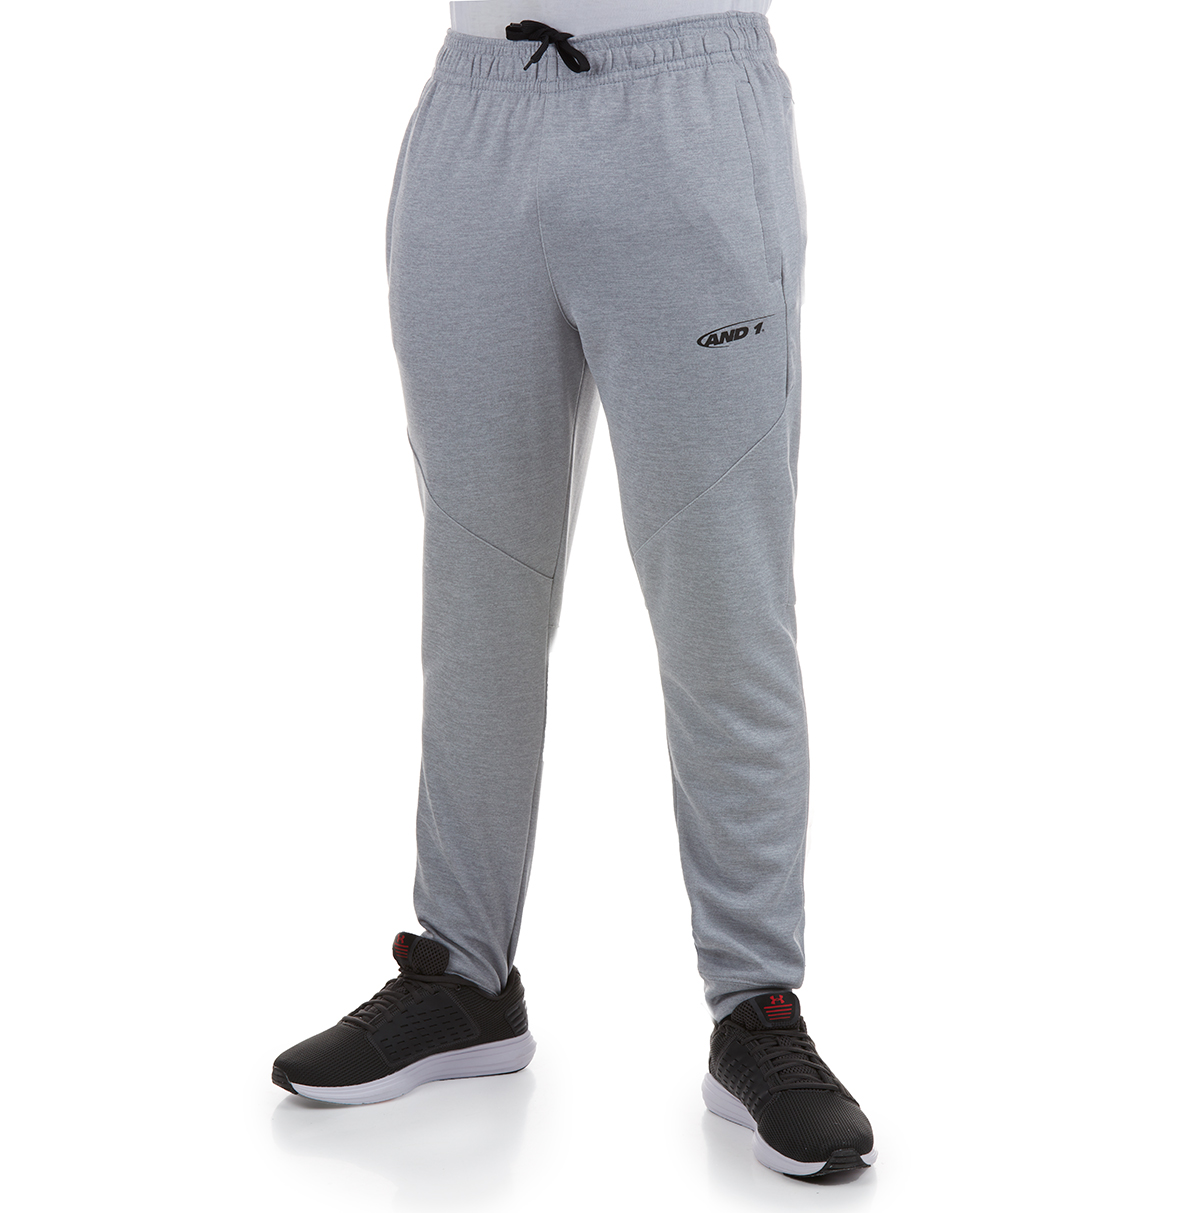 And1 Men's Tricot Jogger Pants - Black, L